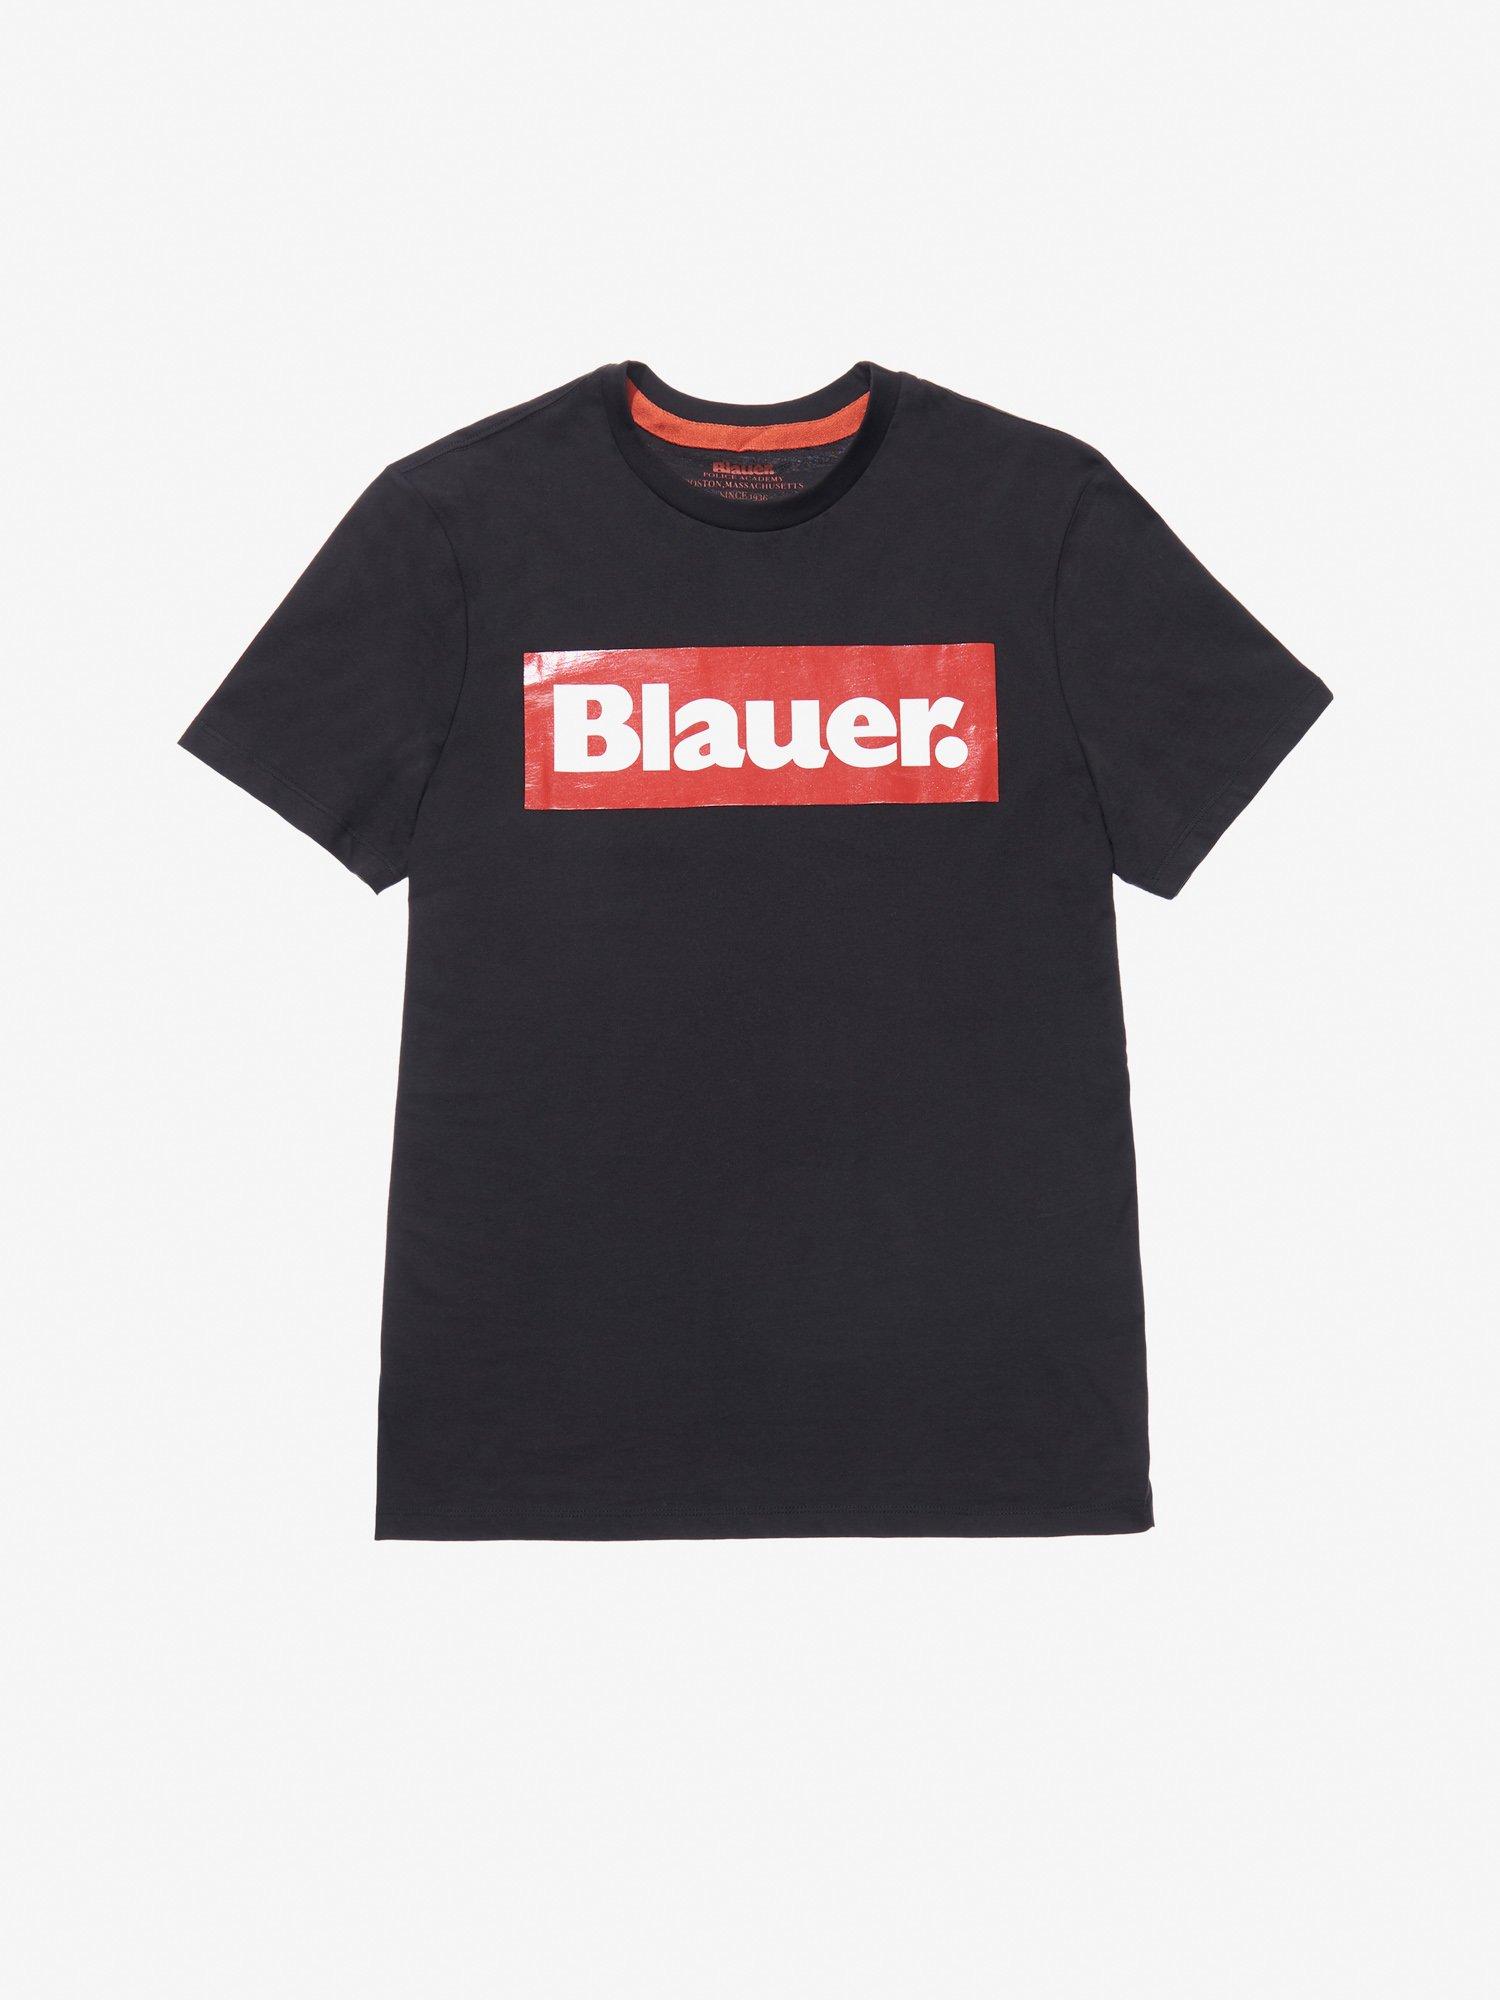 Blauer - CAMISETA ESTAMPADO RECTANGULAR BLAUER - Negro - Blauer